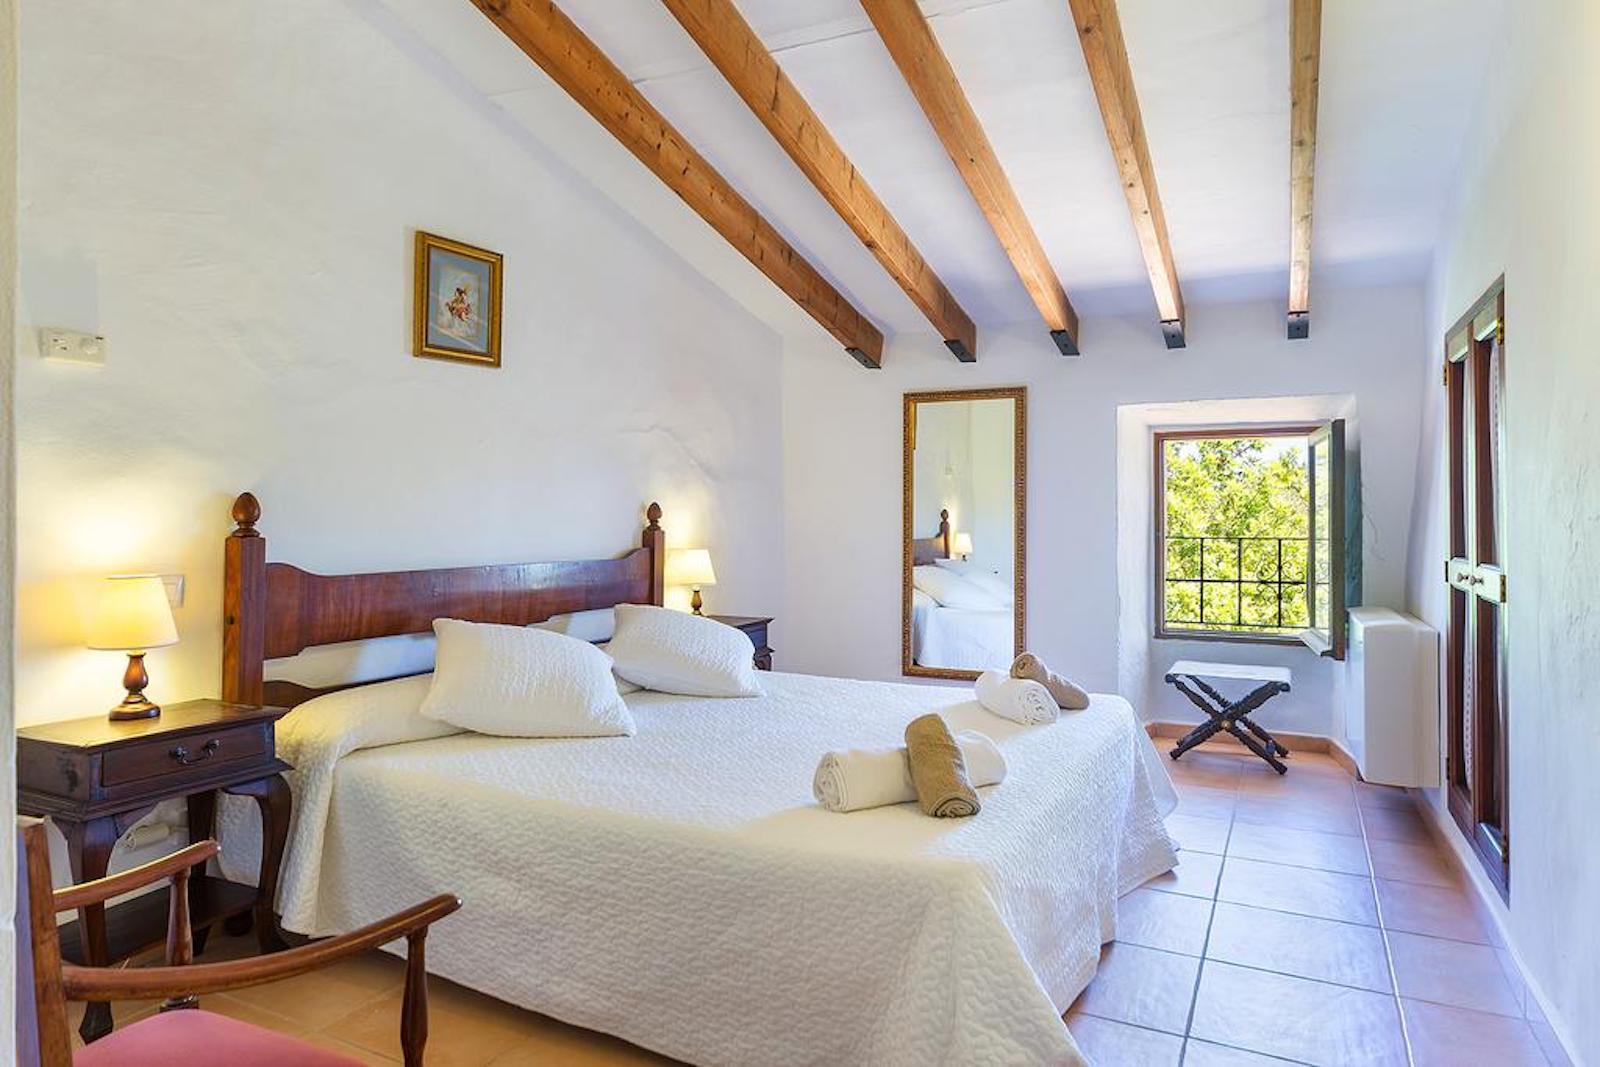 ISLA-Travel-Finca-Hotel-Mallorca-Doppelzimmer-deluxe